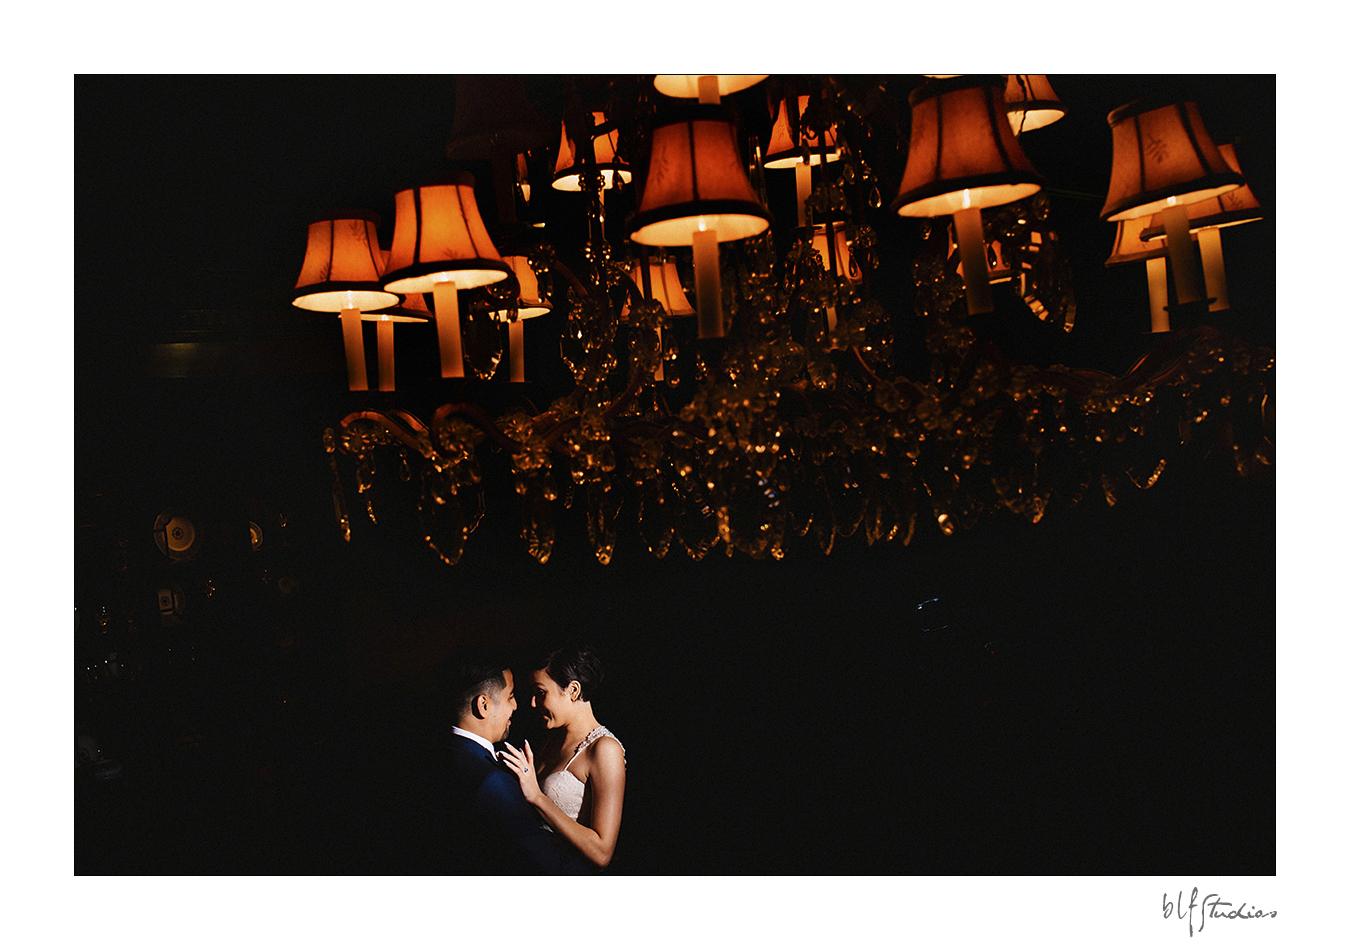 0035-blfstudios-wedding-photographer-daniel-danielle-atlanta.jpg